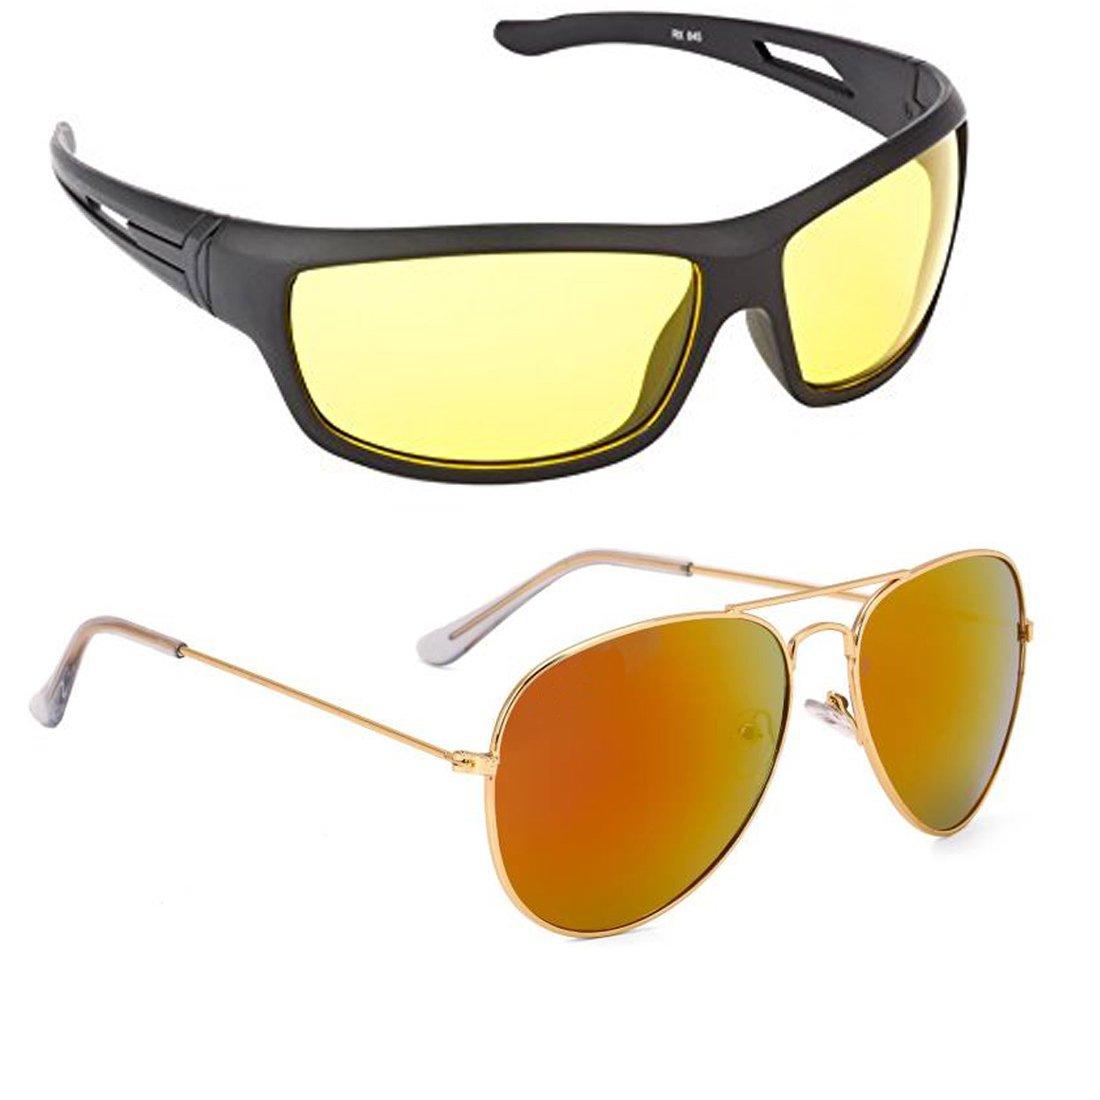 ELLIGATOR Driving at Day and Night Fishing Outdoor Yellow Unisex Anti Glare Sunglasses